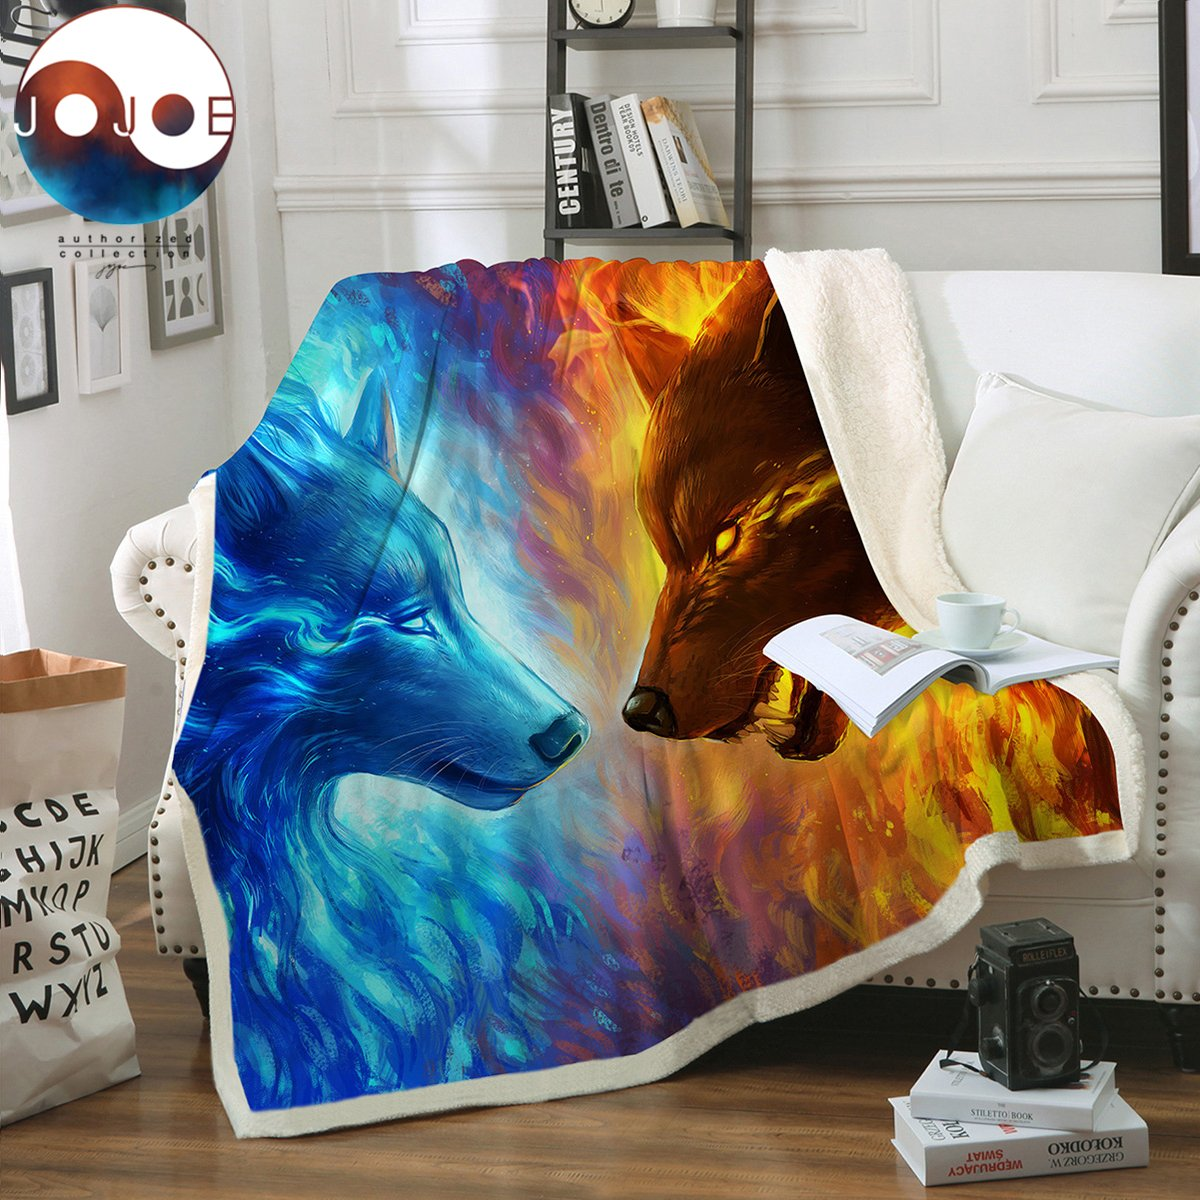 Sleepwish Fire and Ice by JoJoesArt Wolf Sherpa Blanket Blue Orange Animal Print Plush Blanket Thick Machine Washable 60''x80''